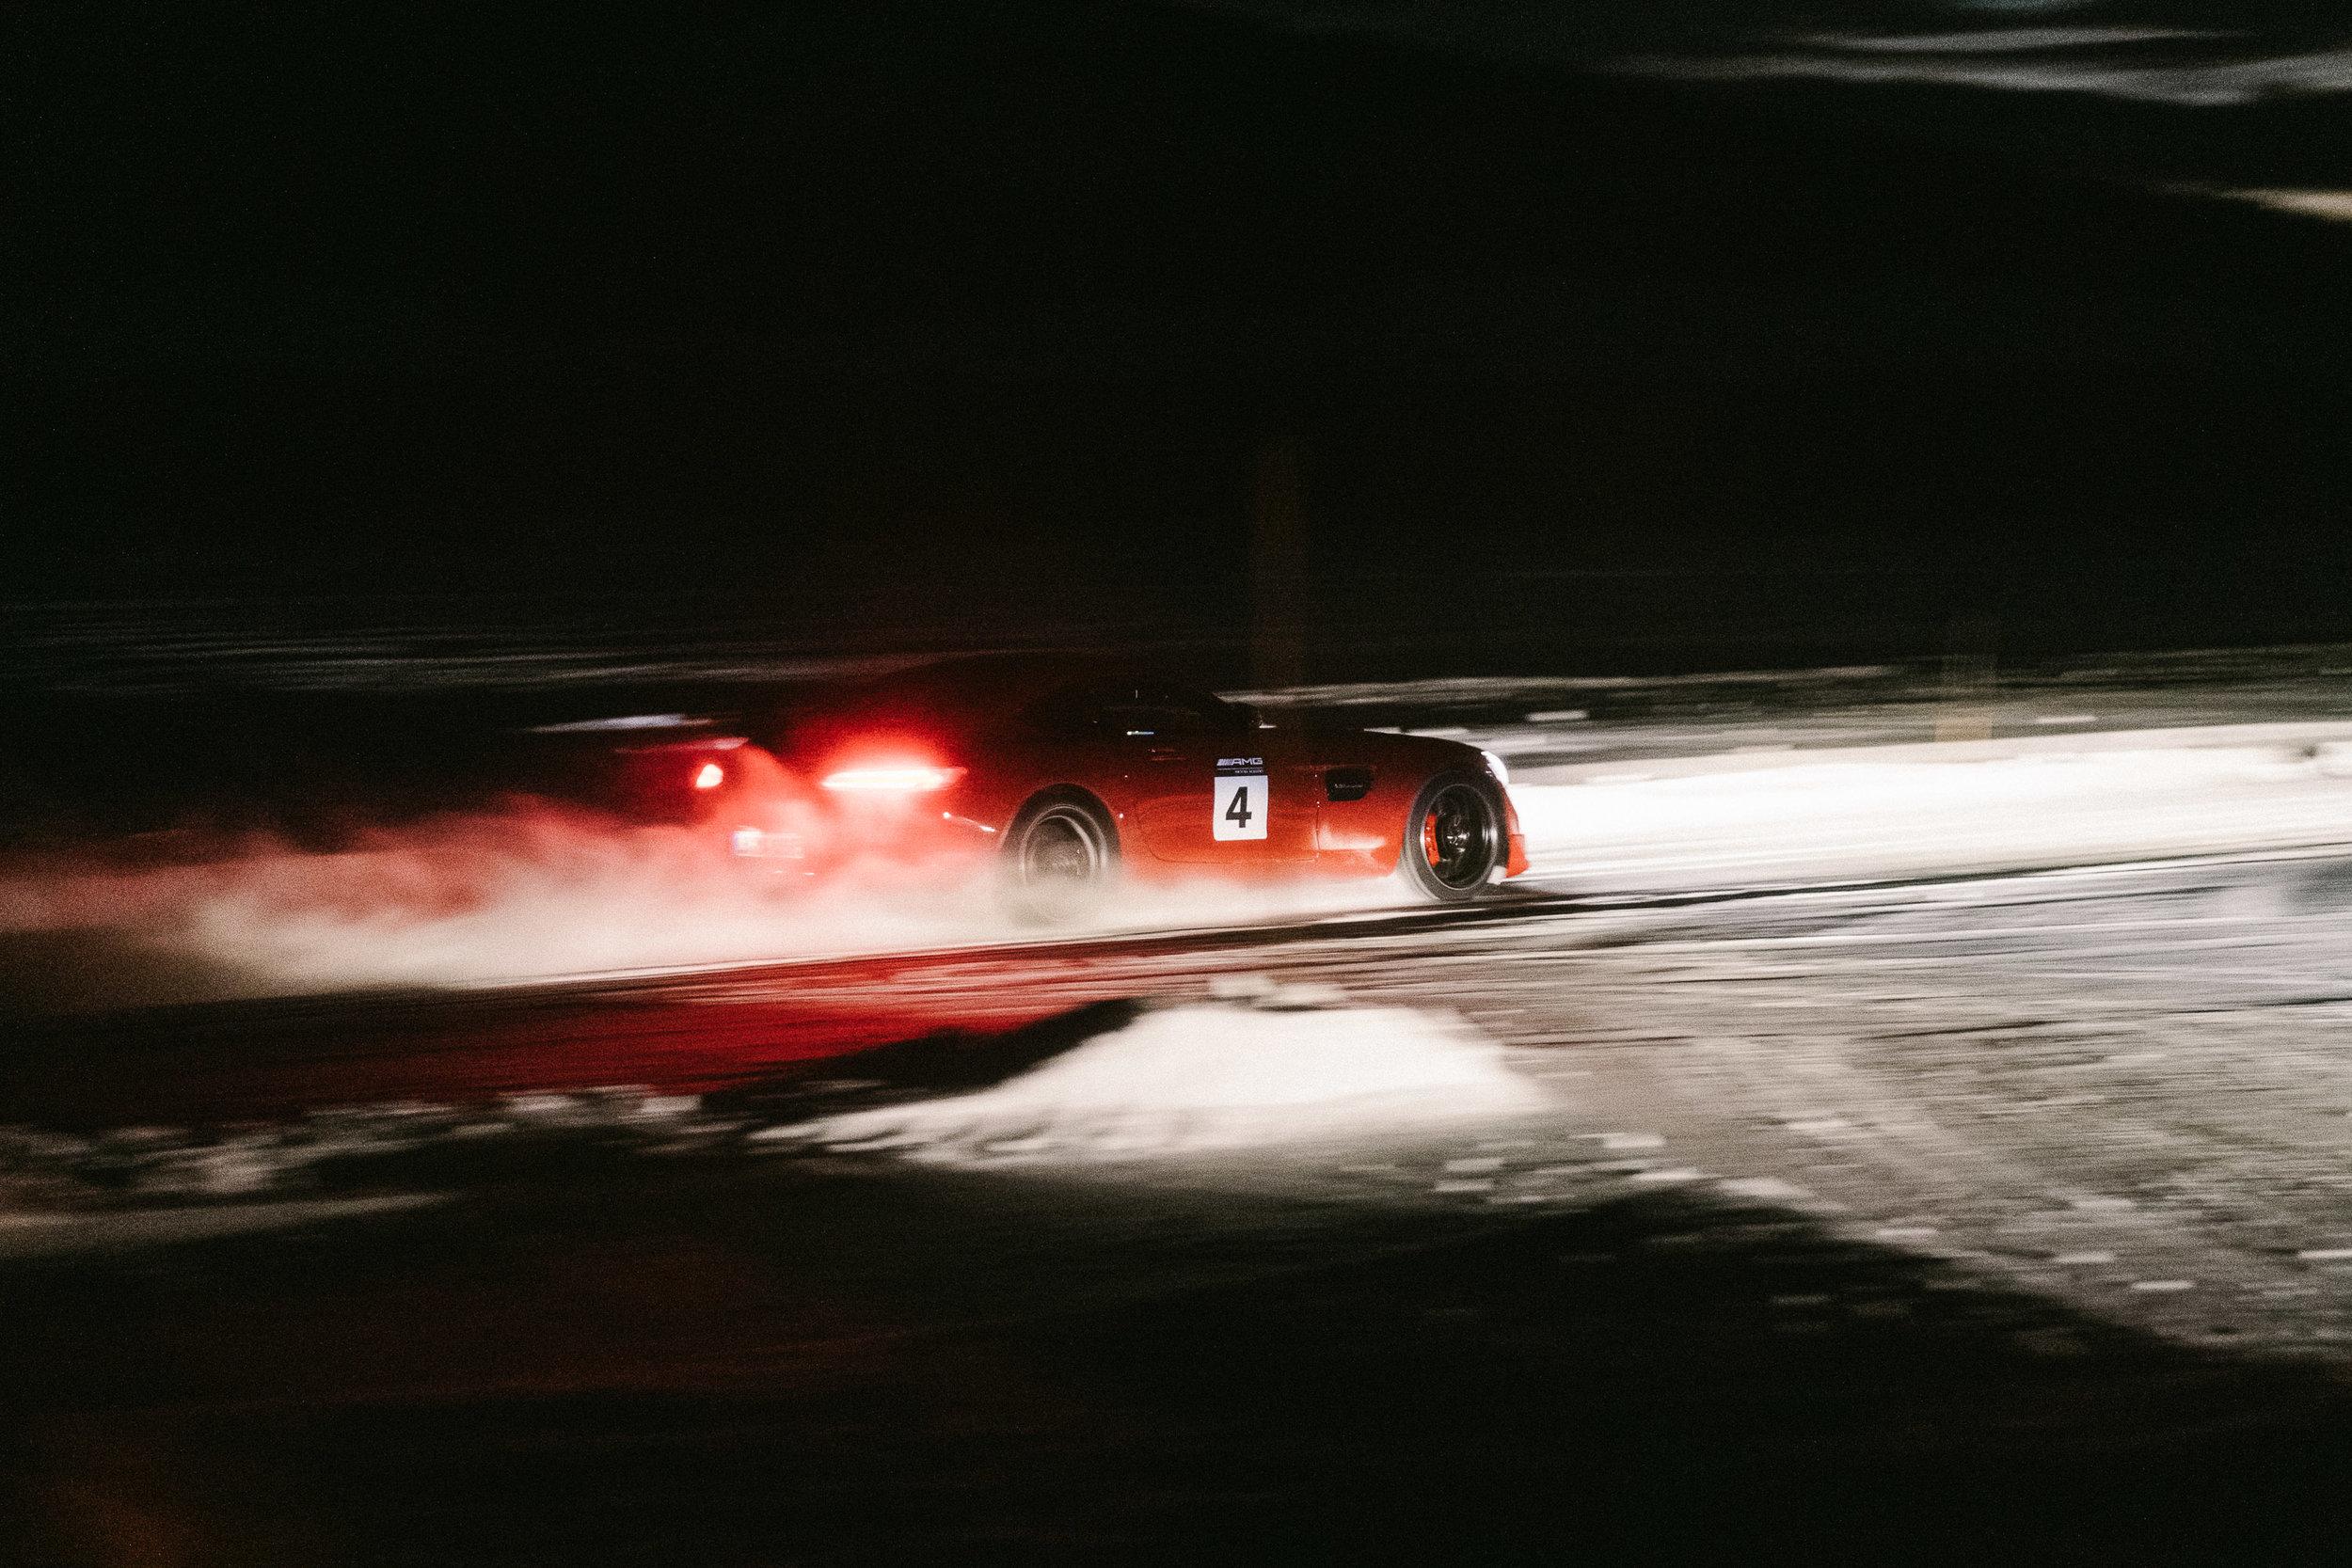 Drive_for_Good_Ice_Drive_by_Maxim_Kuijper-9106.jpg